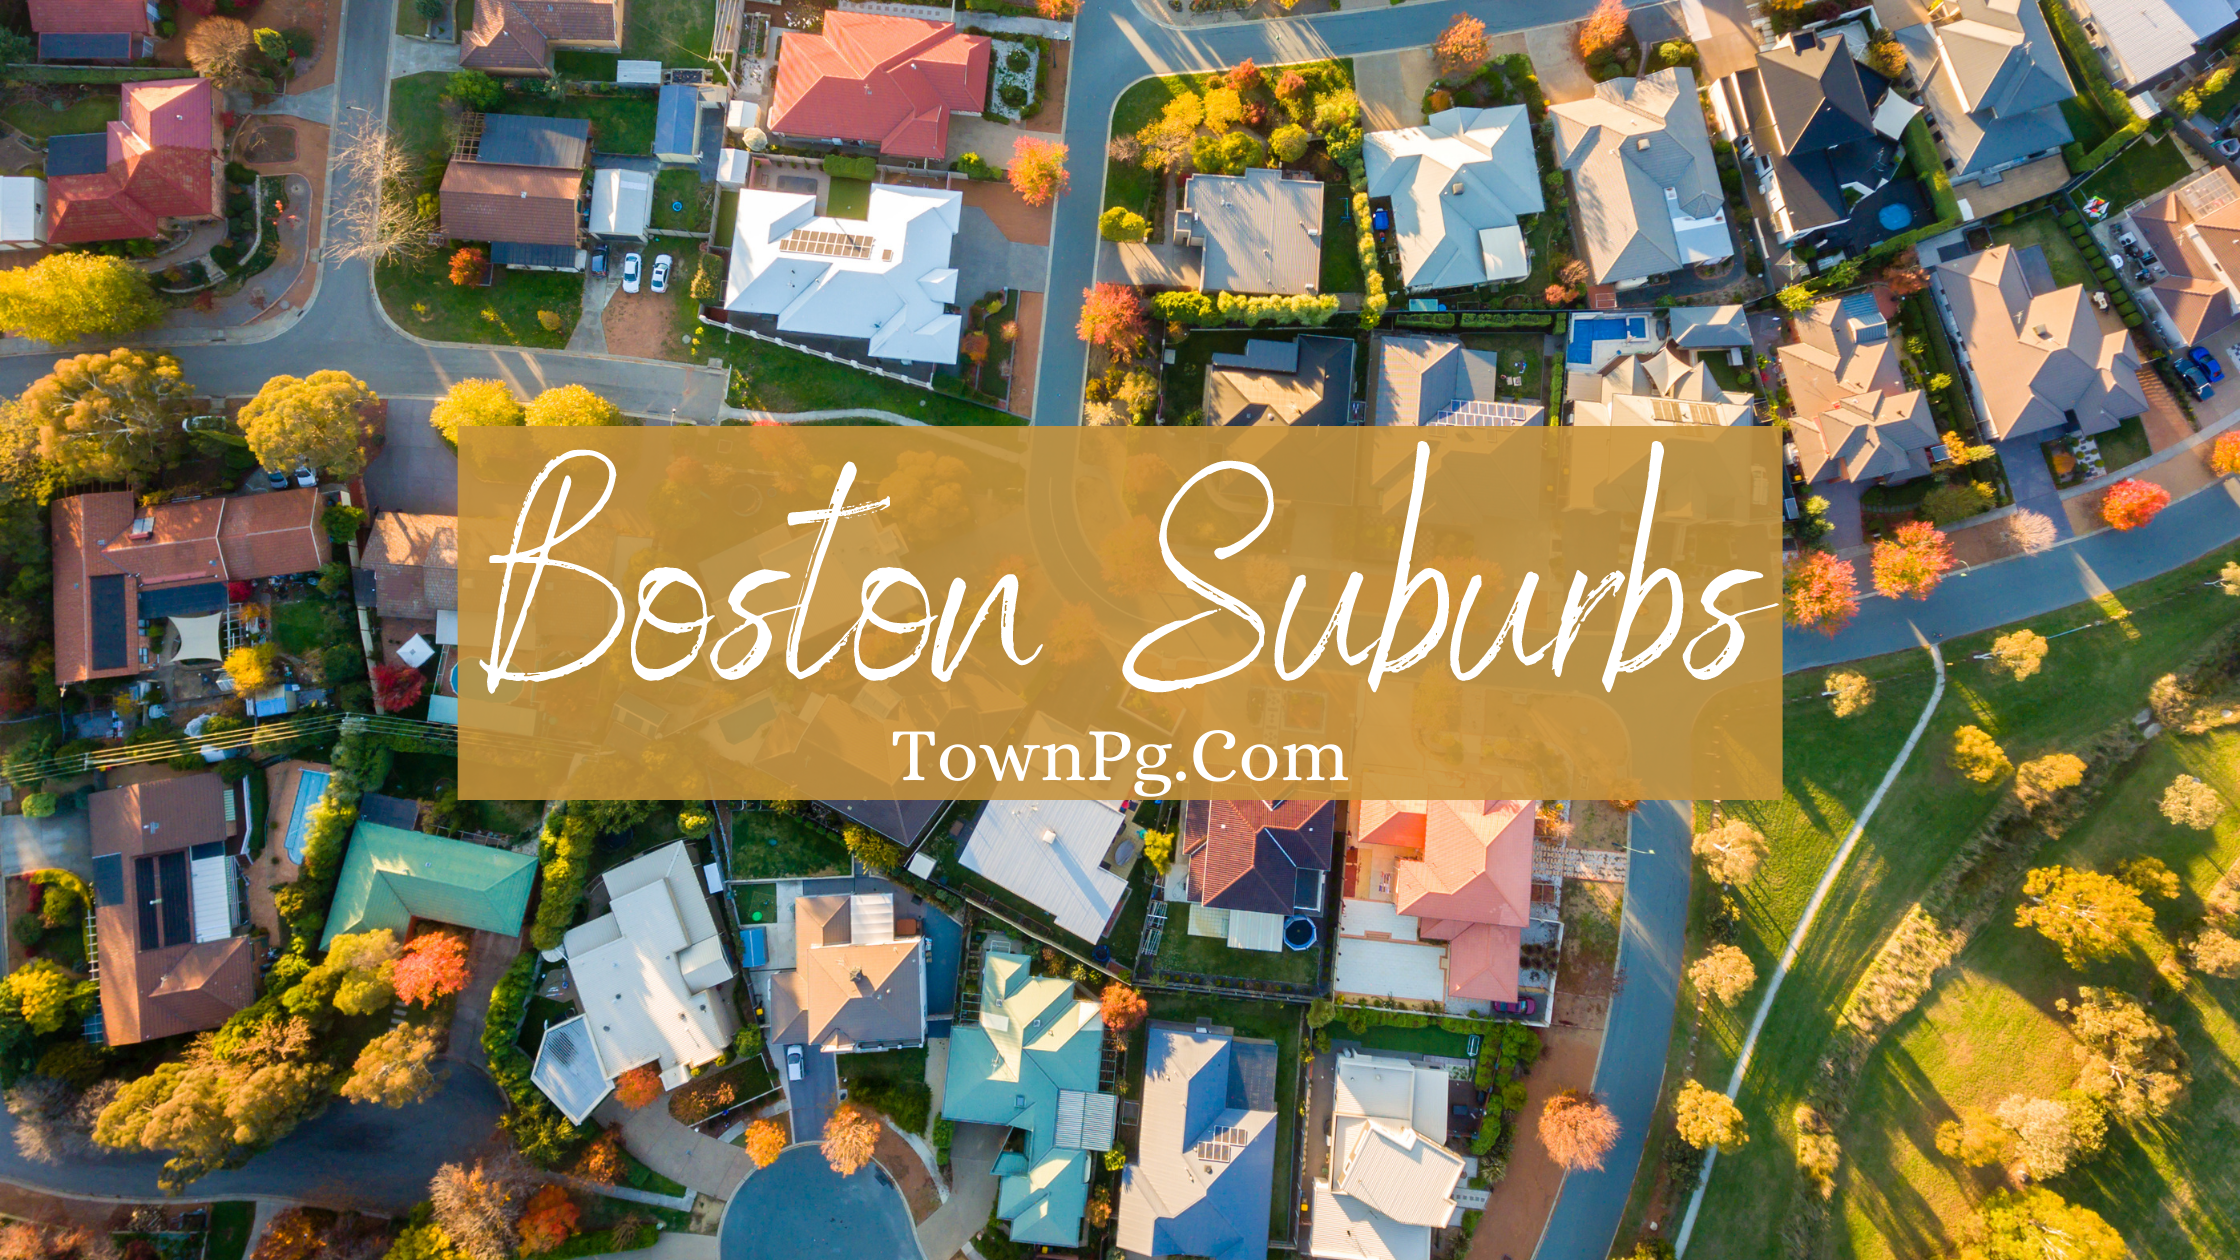 3 Perks of Calling the Boston Suburbs Home